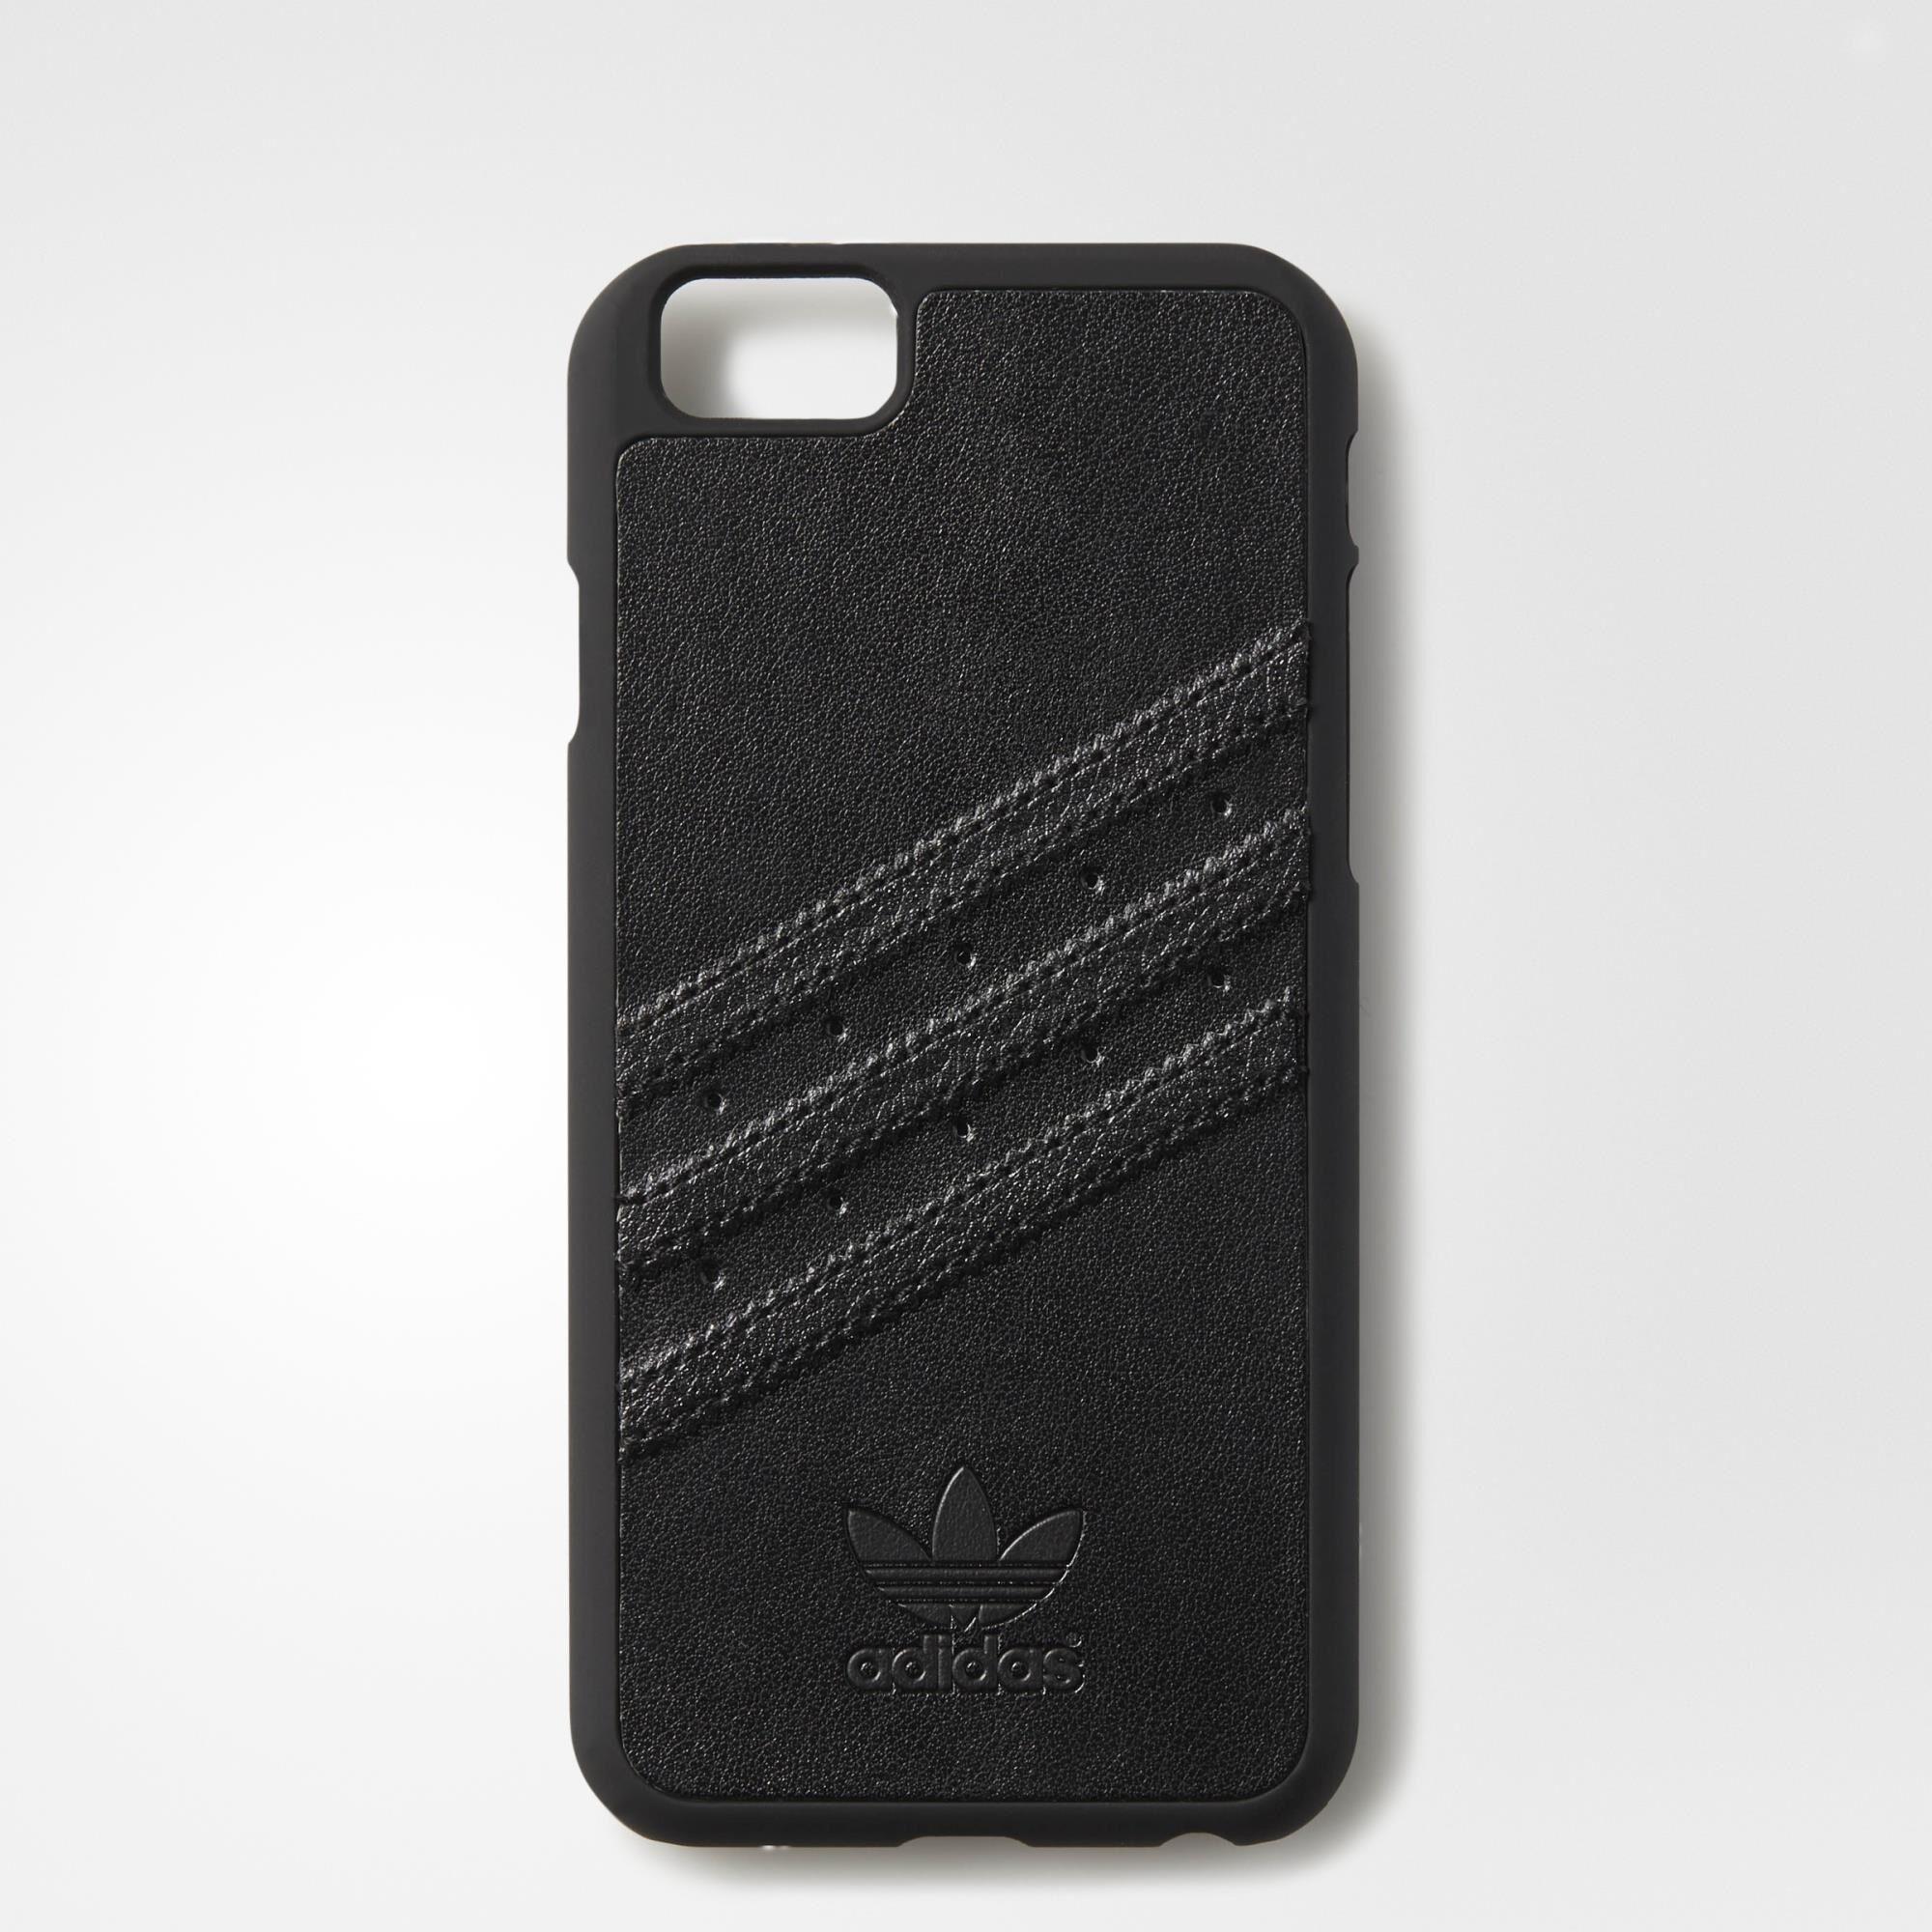 adidas originals iphone 6 case. Black Bedroom Furniture Sets. Home Design Ideas